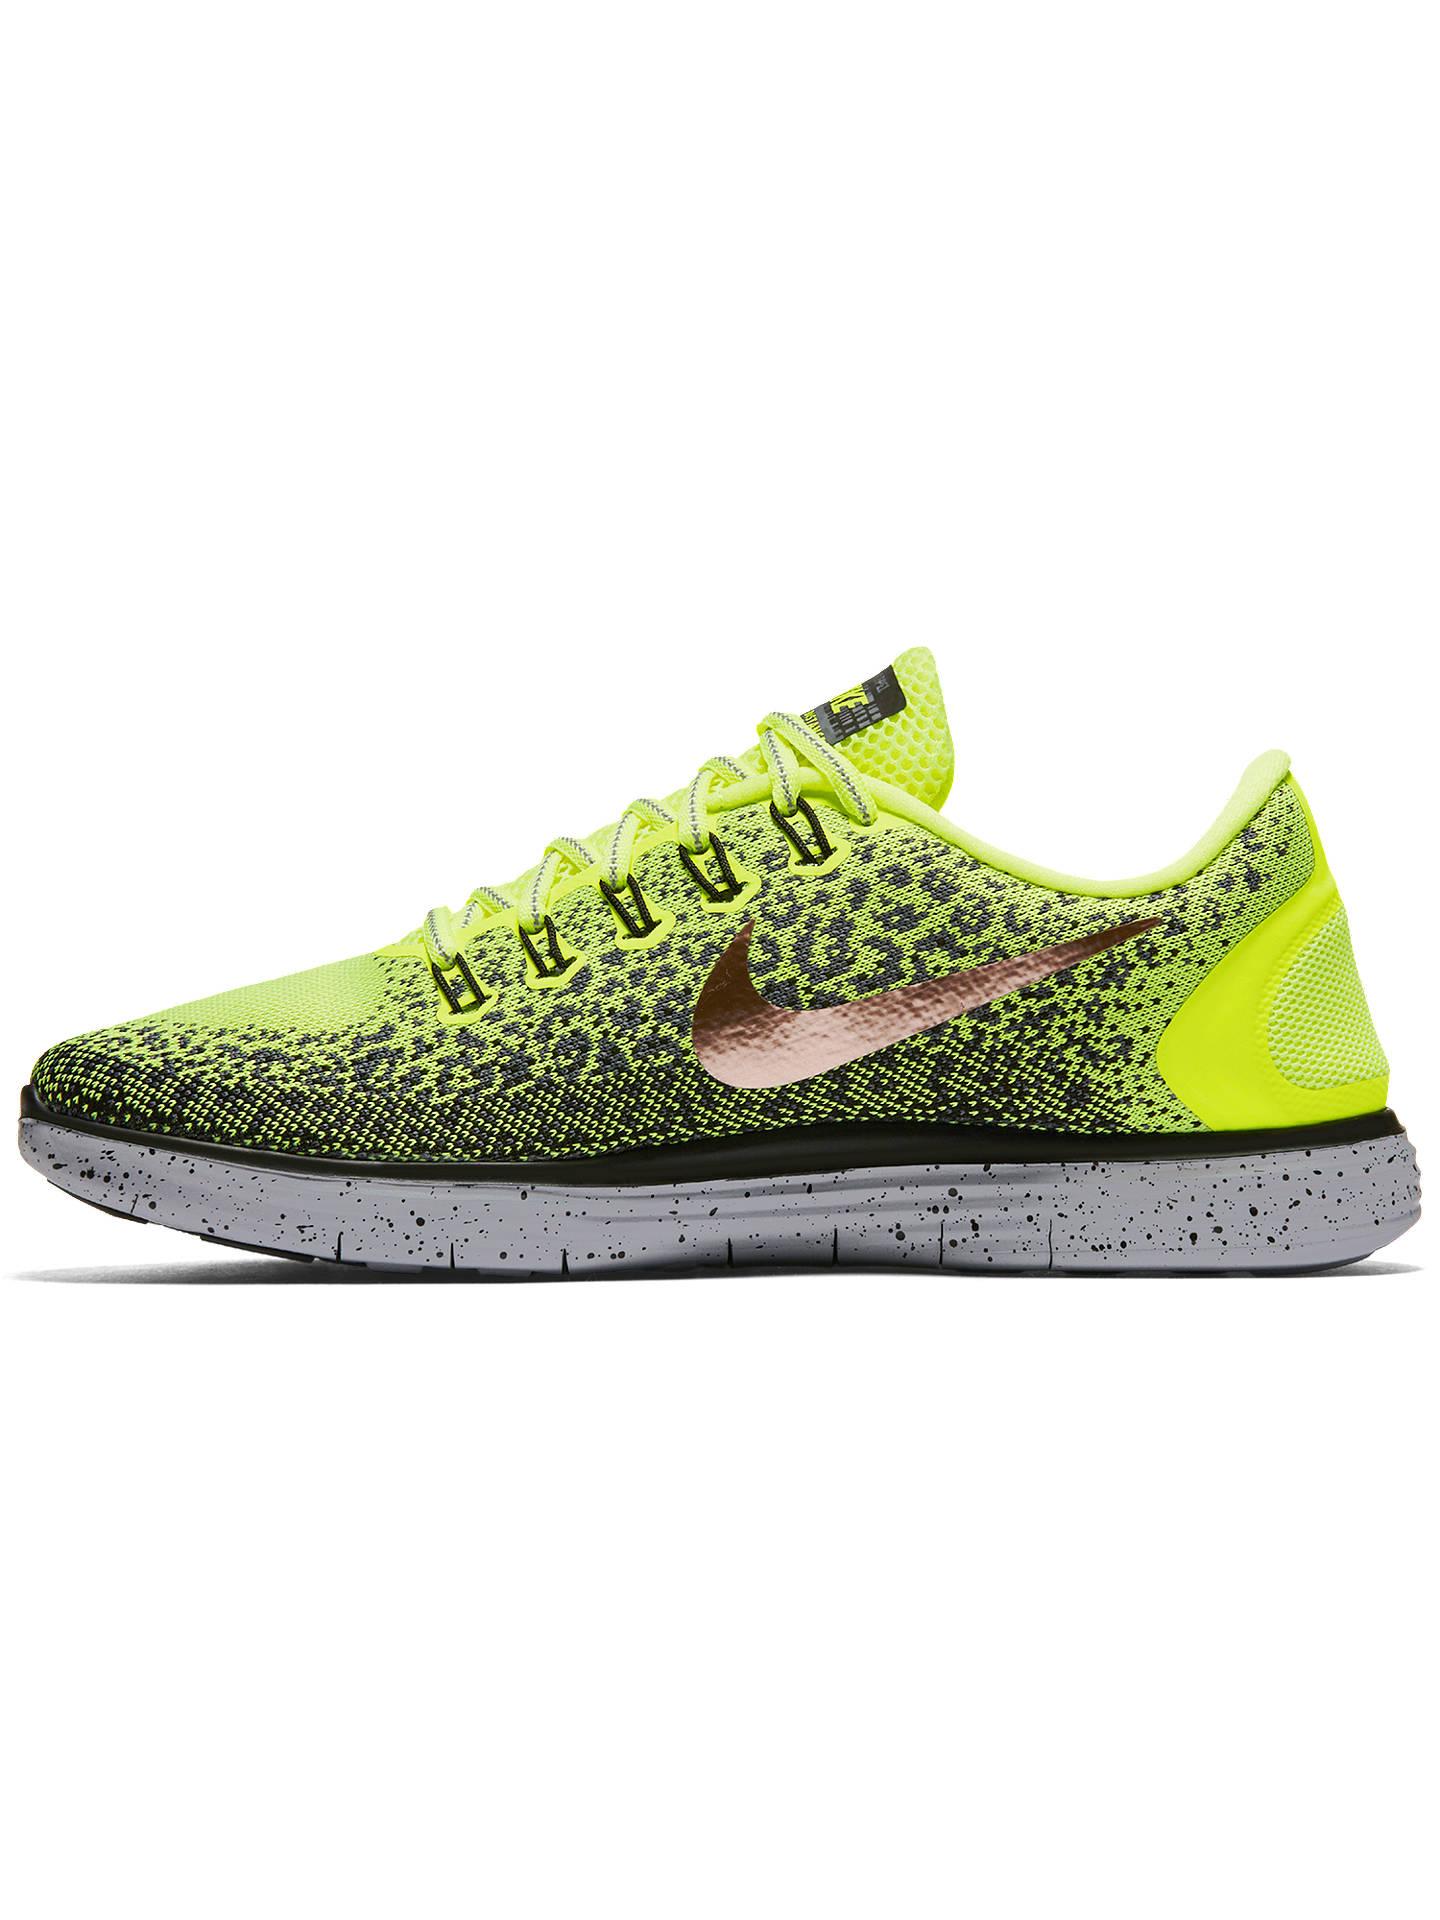 newest 17cd0 e4da7 ... Buy Nike Free RN Distance Shield Men s Running Shoes, Volt Black, 7  Online ...